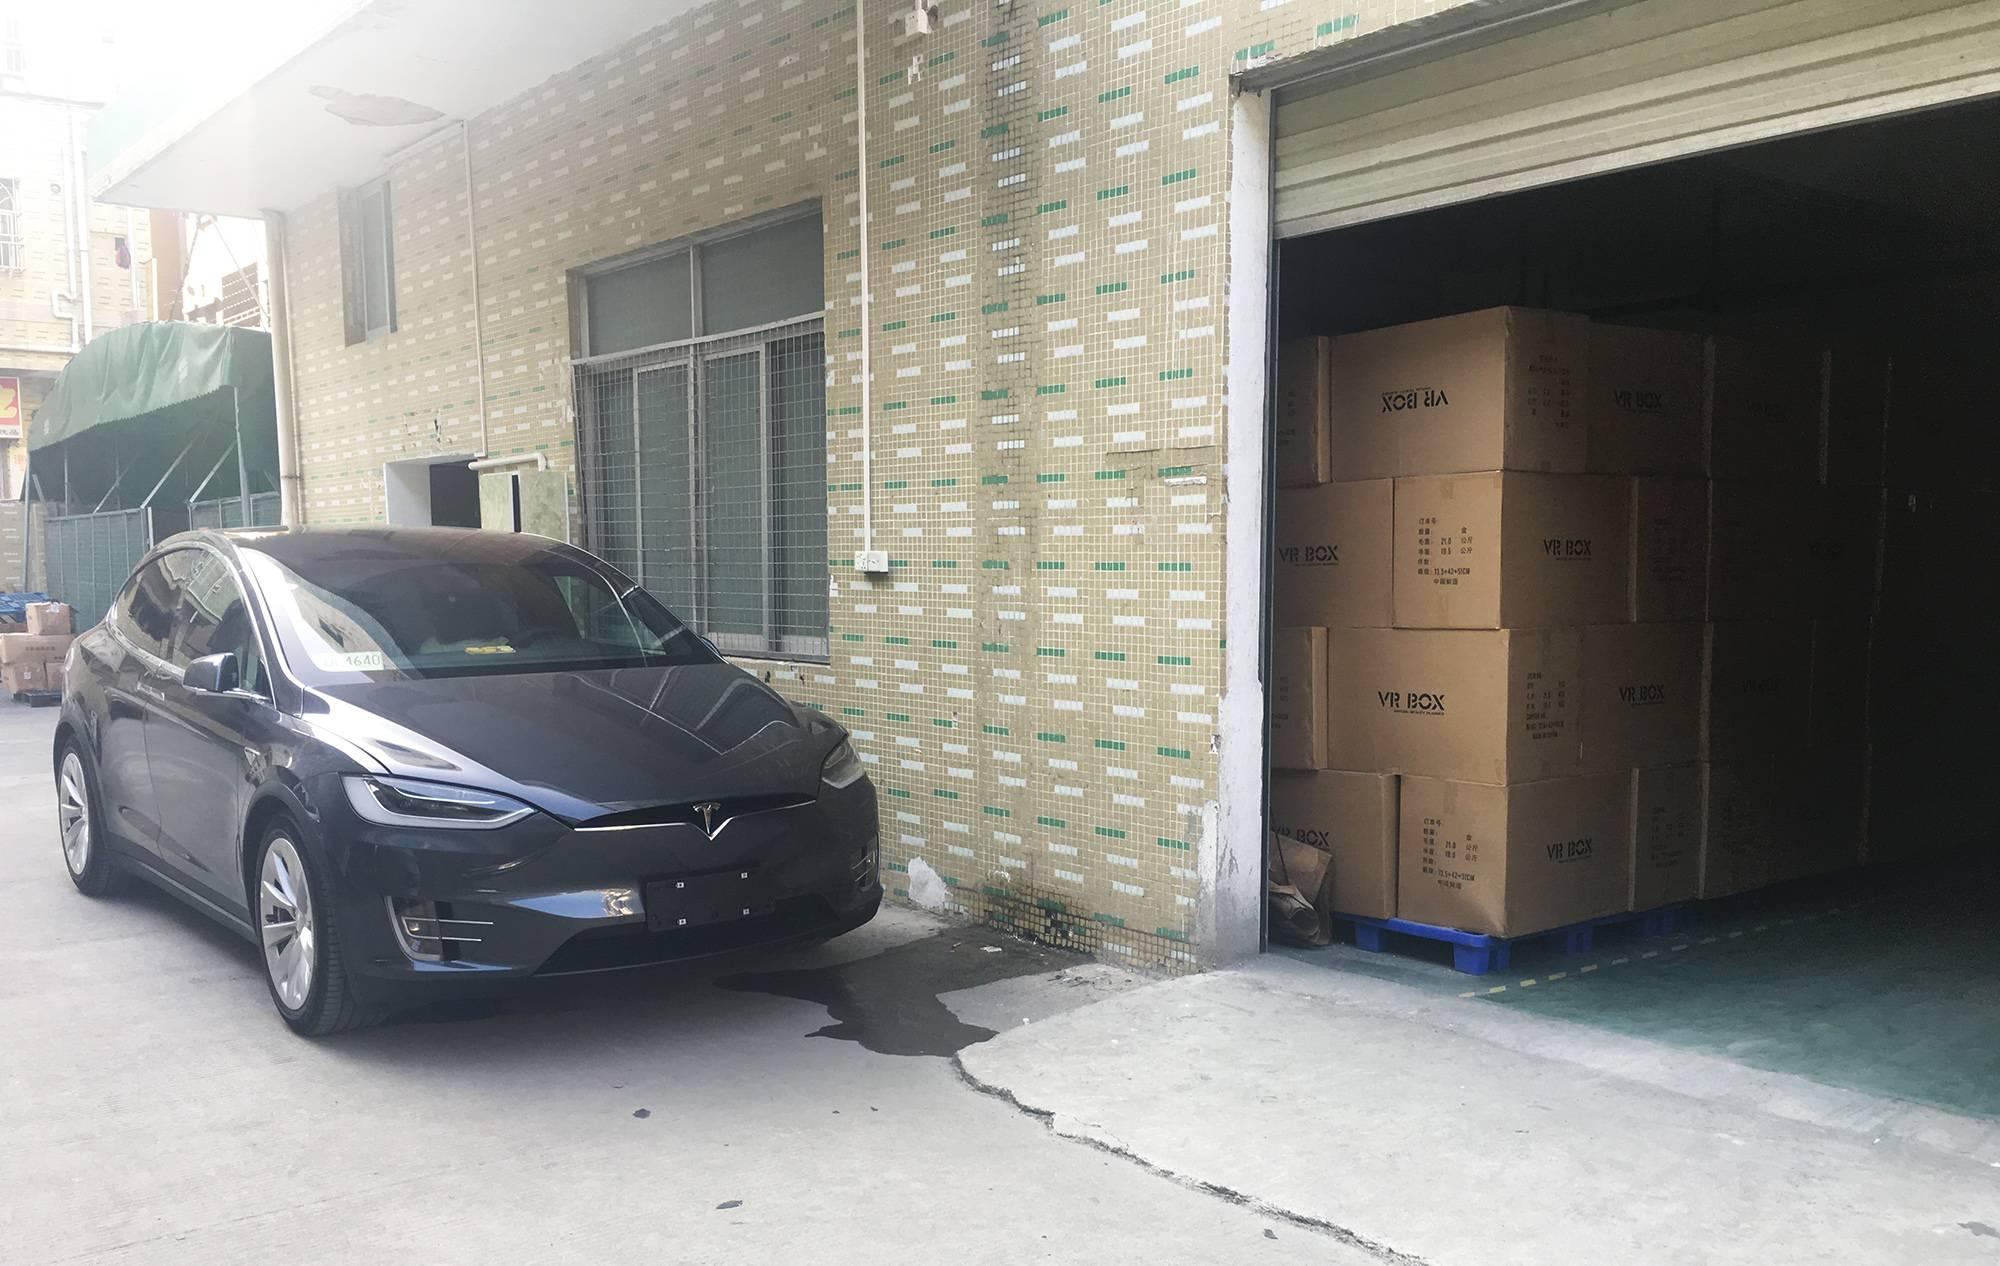 VR Box 的厂房正日夜赶工